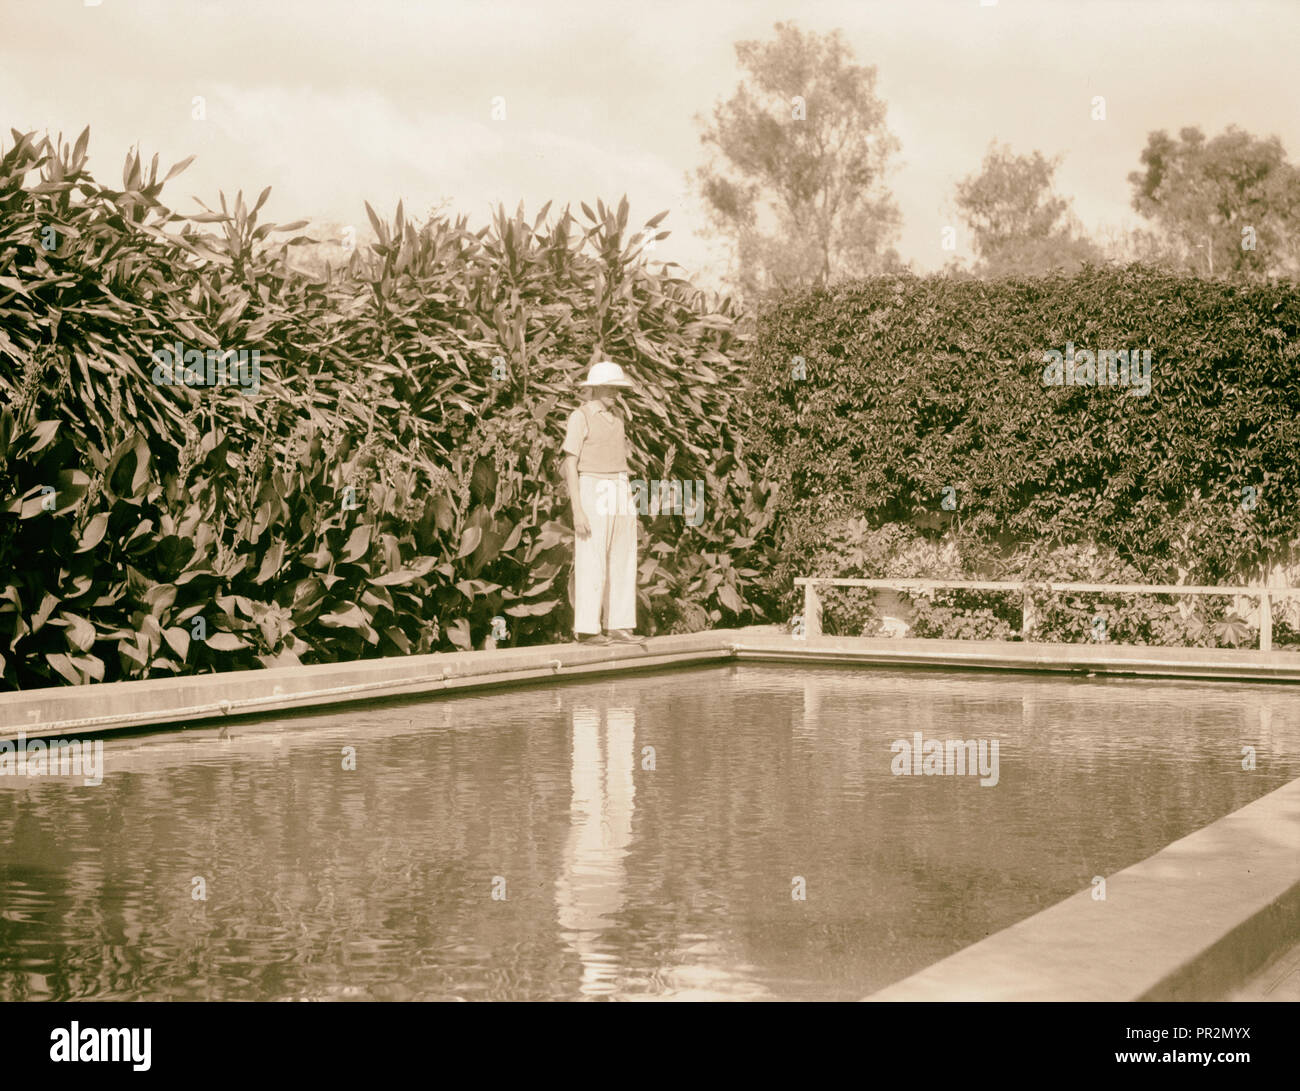 Tanganyika. Arusha. Arusha Hotel. Swimming pool in the midst of luxuriant vegetation. 1936, Tanzania, Arusha - Stock Image